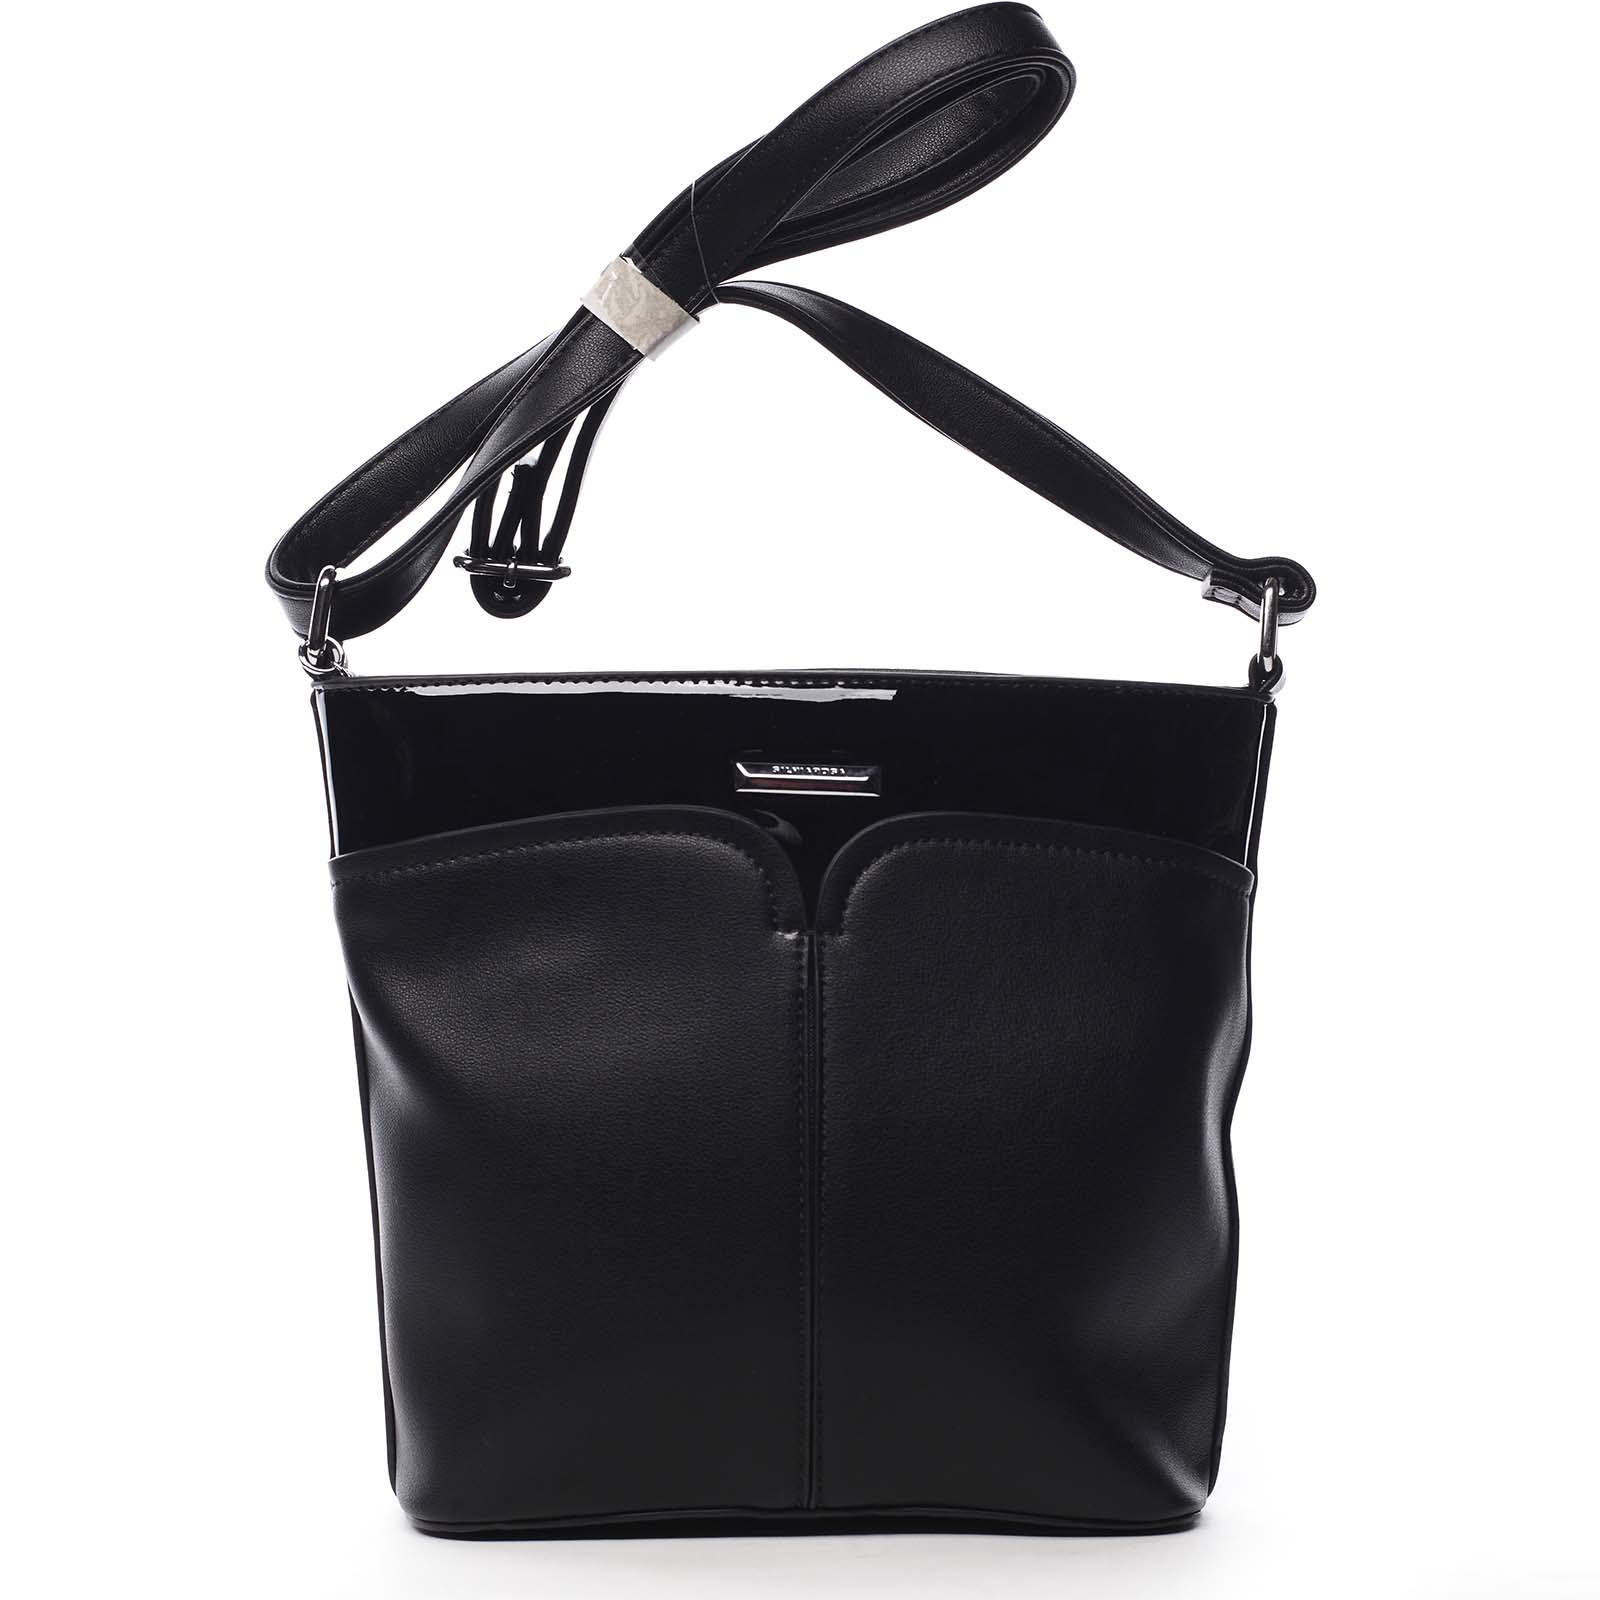 Dámská crossbody kabelka černá - Silvia Rosa Enegmi